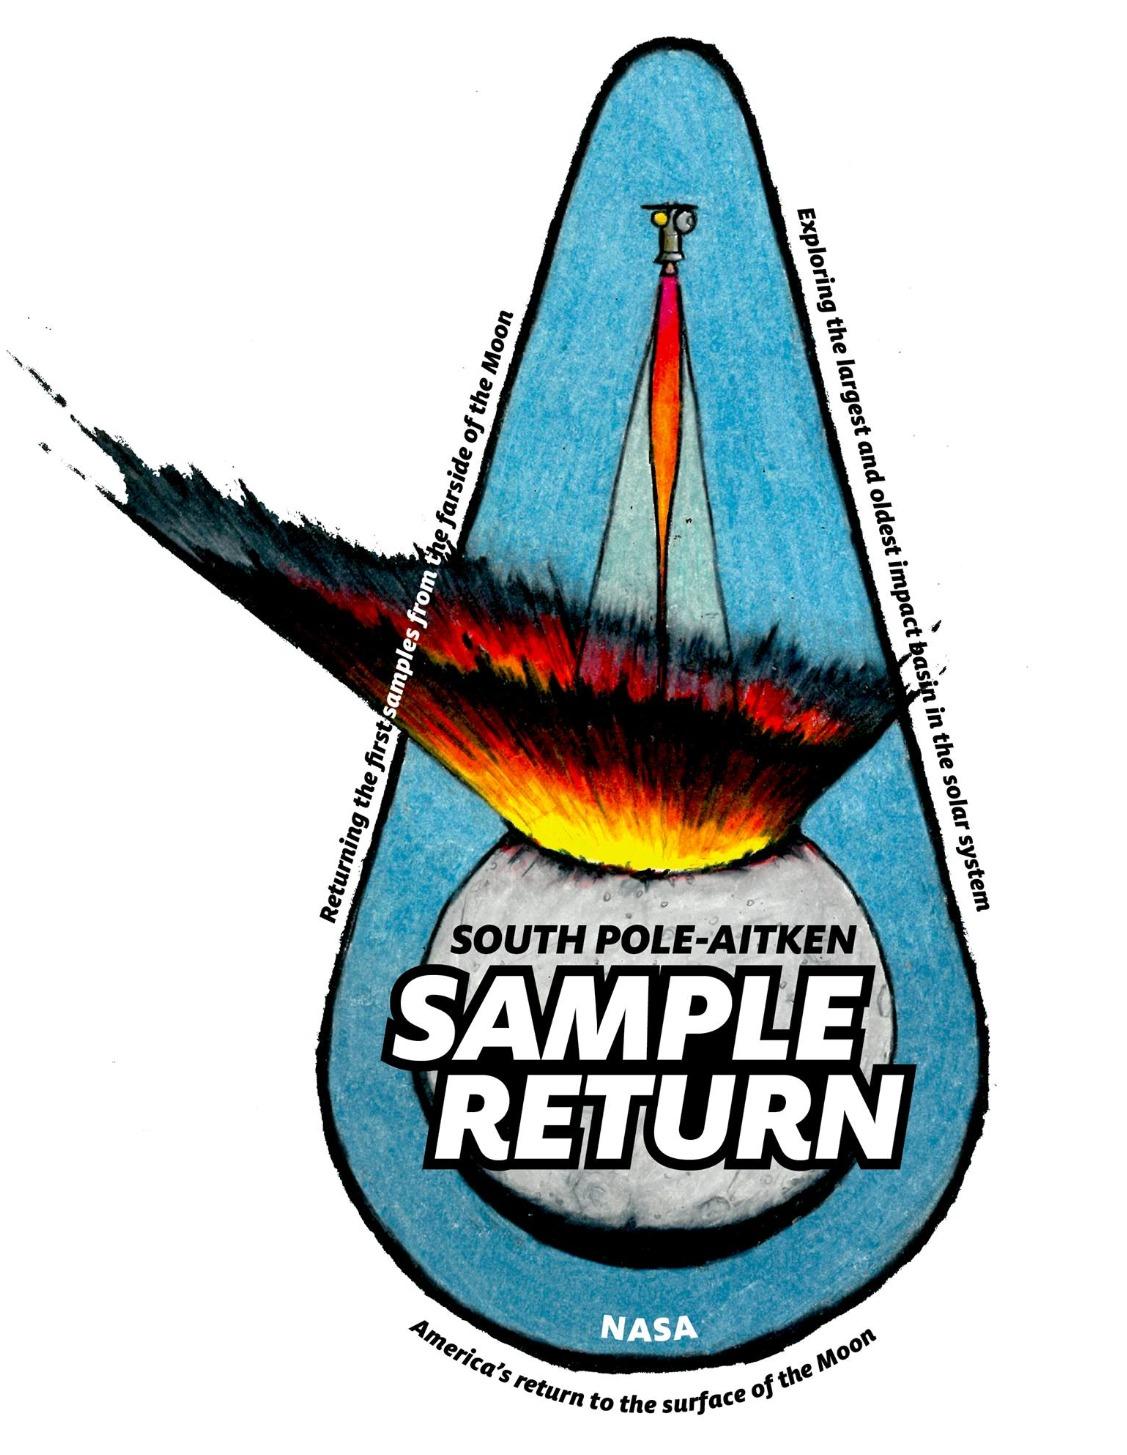 South Pole-Aitken Sample Return